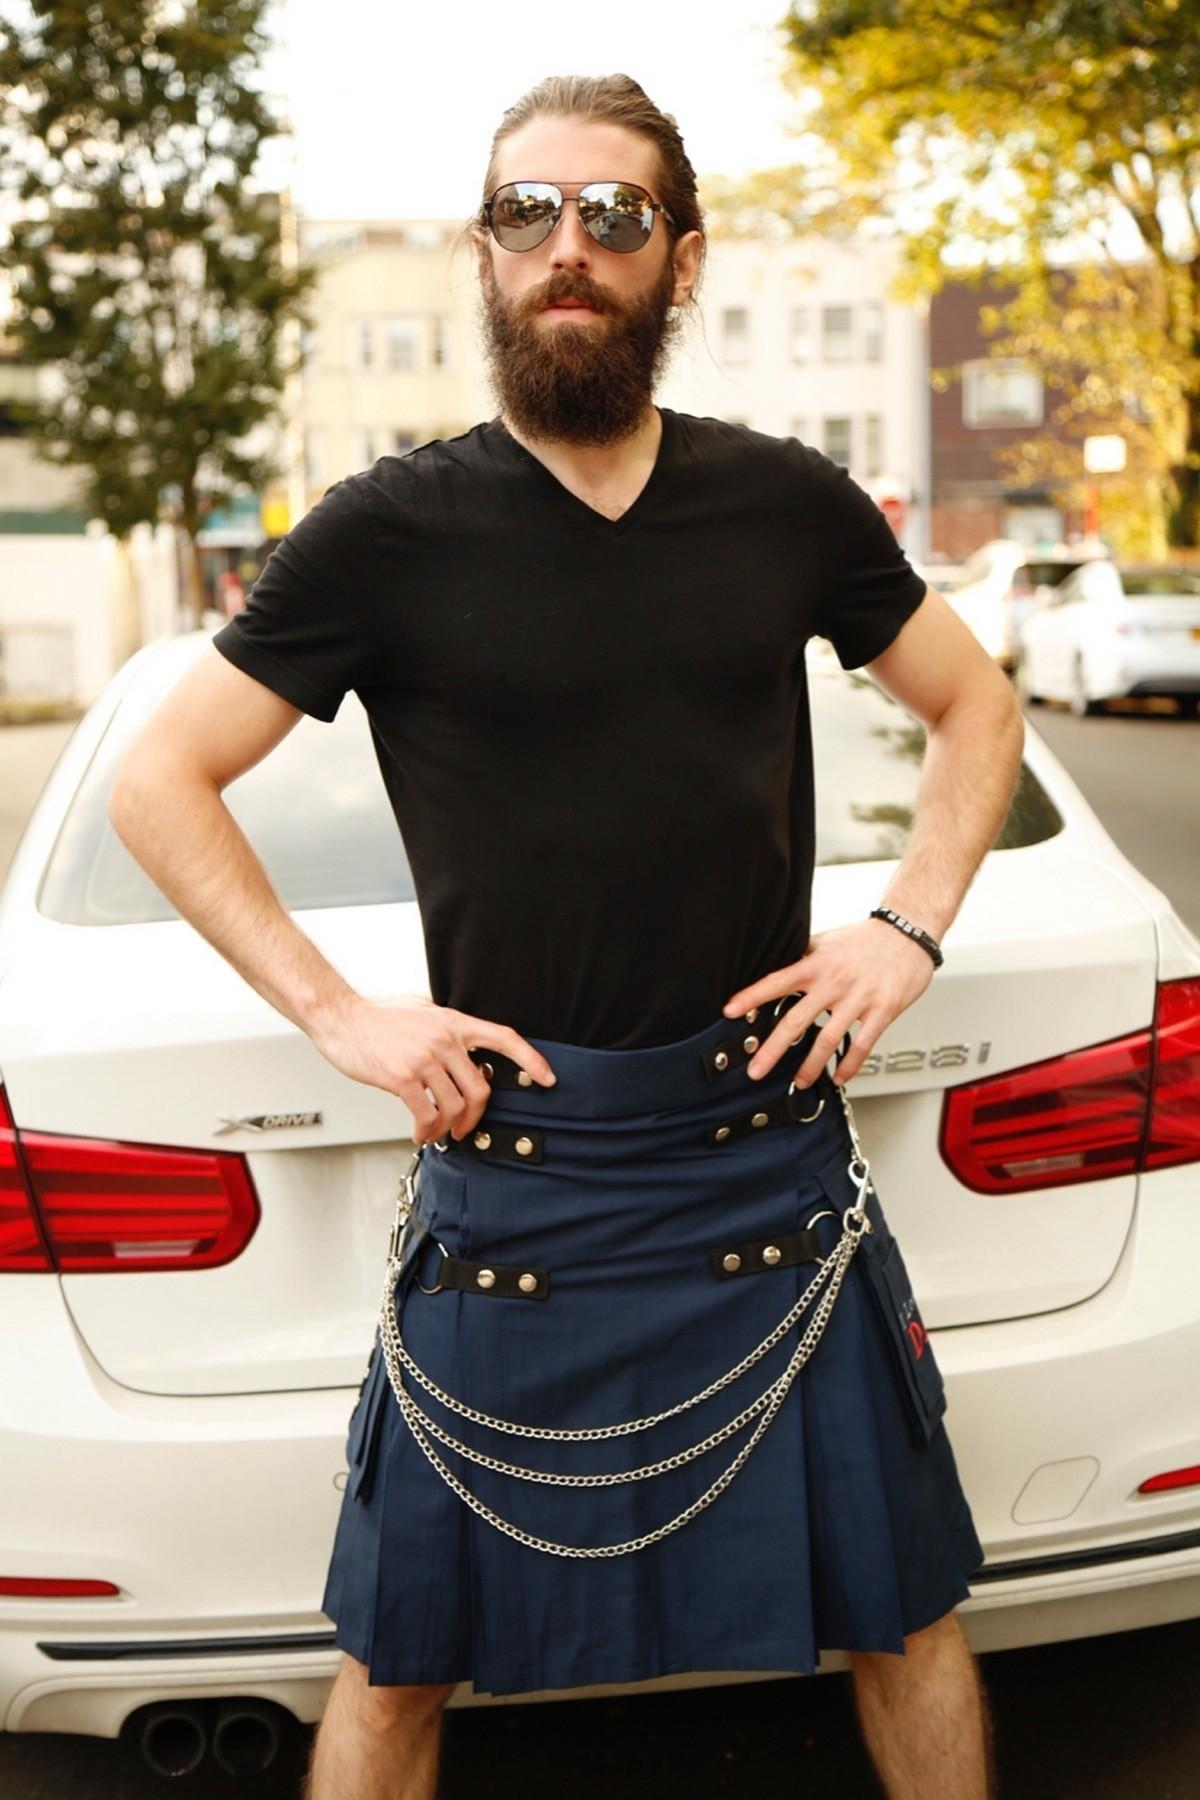 Fashion Kilt For Stylish Men